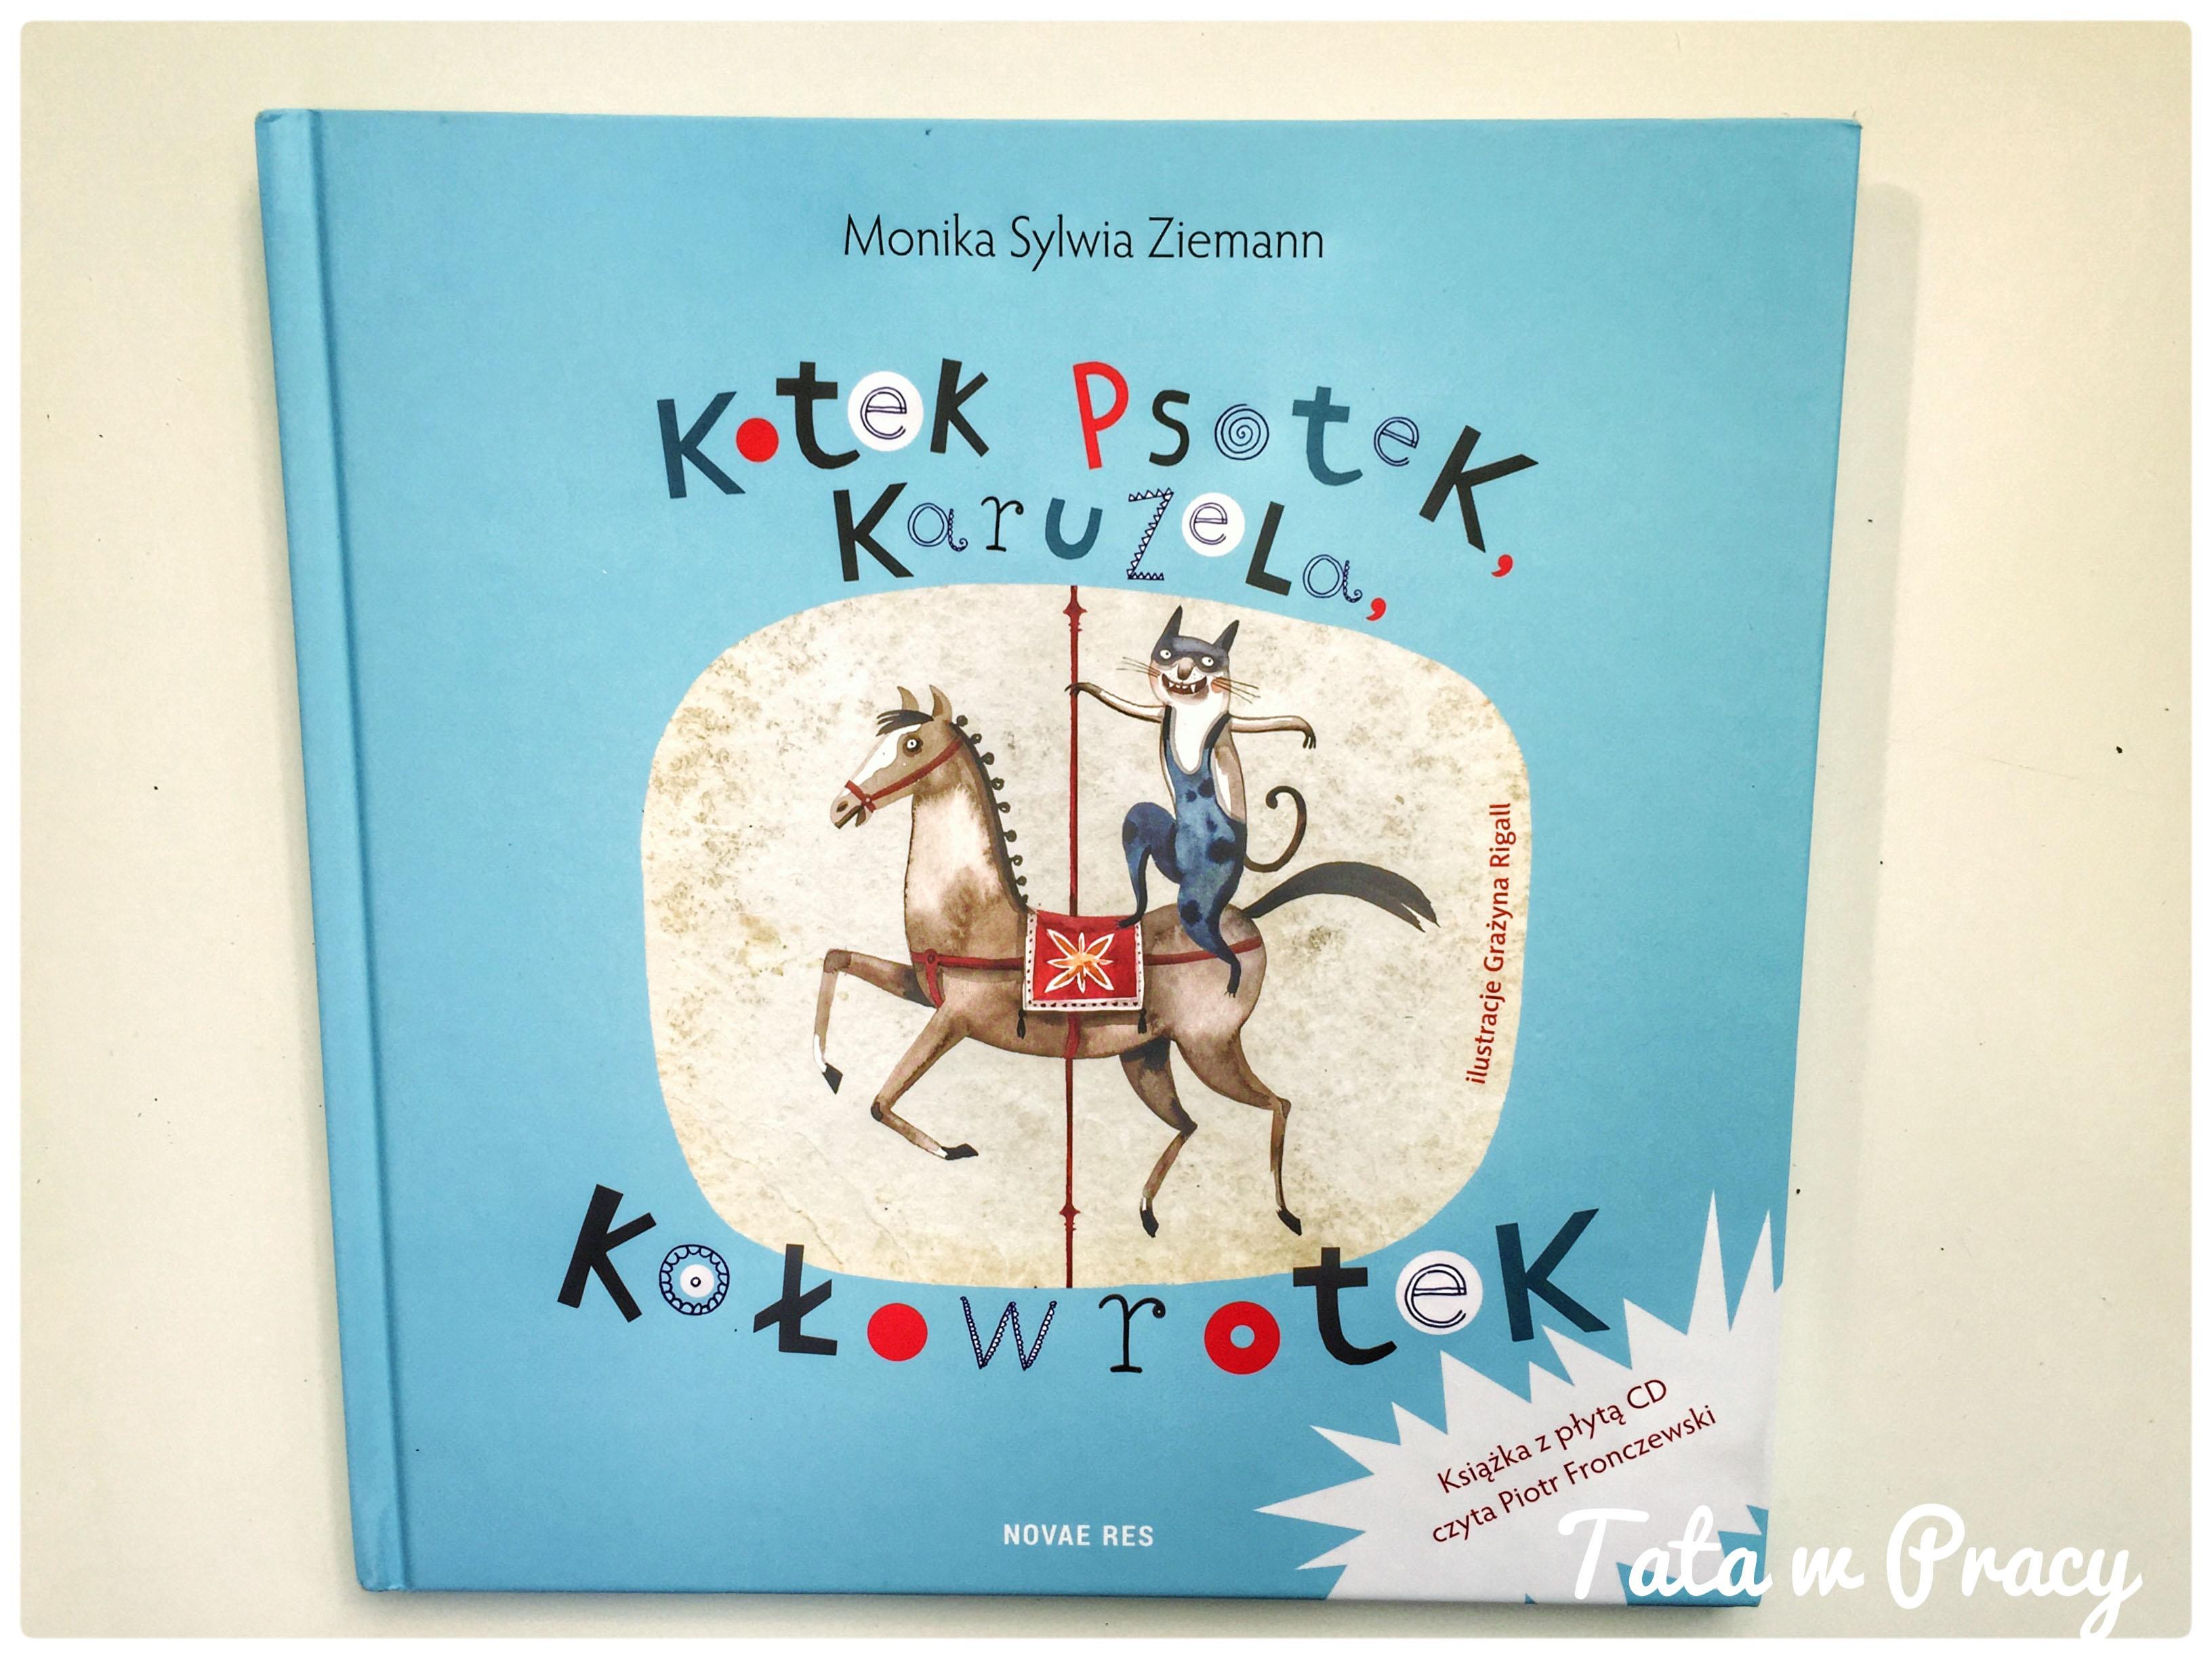 """Kotek Psotek Karuzela Kołowrotek"", Wydawnictwo Novae Res"